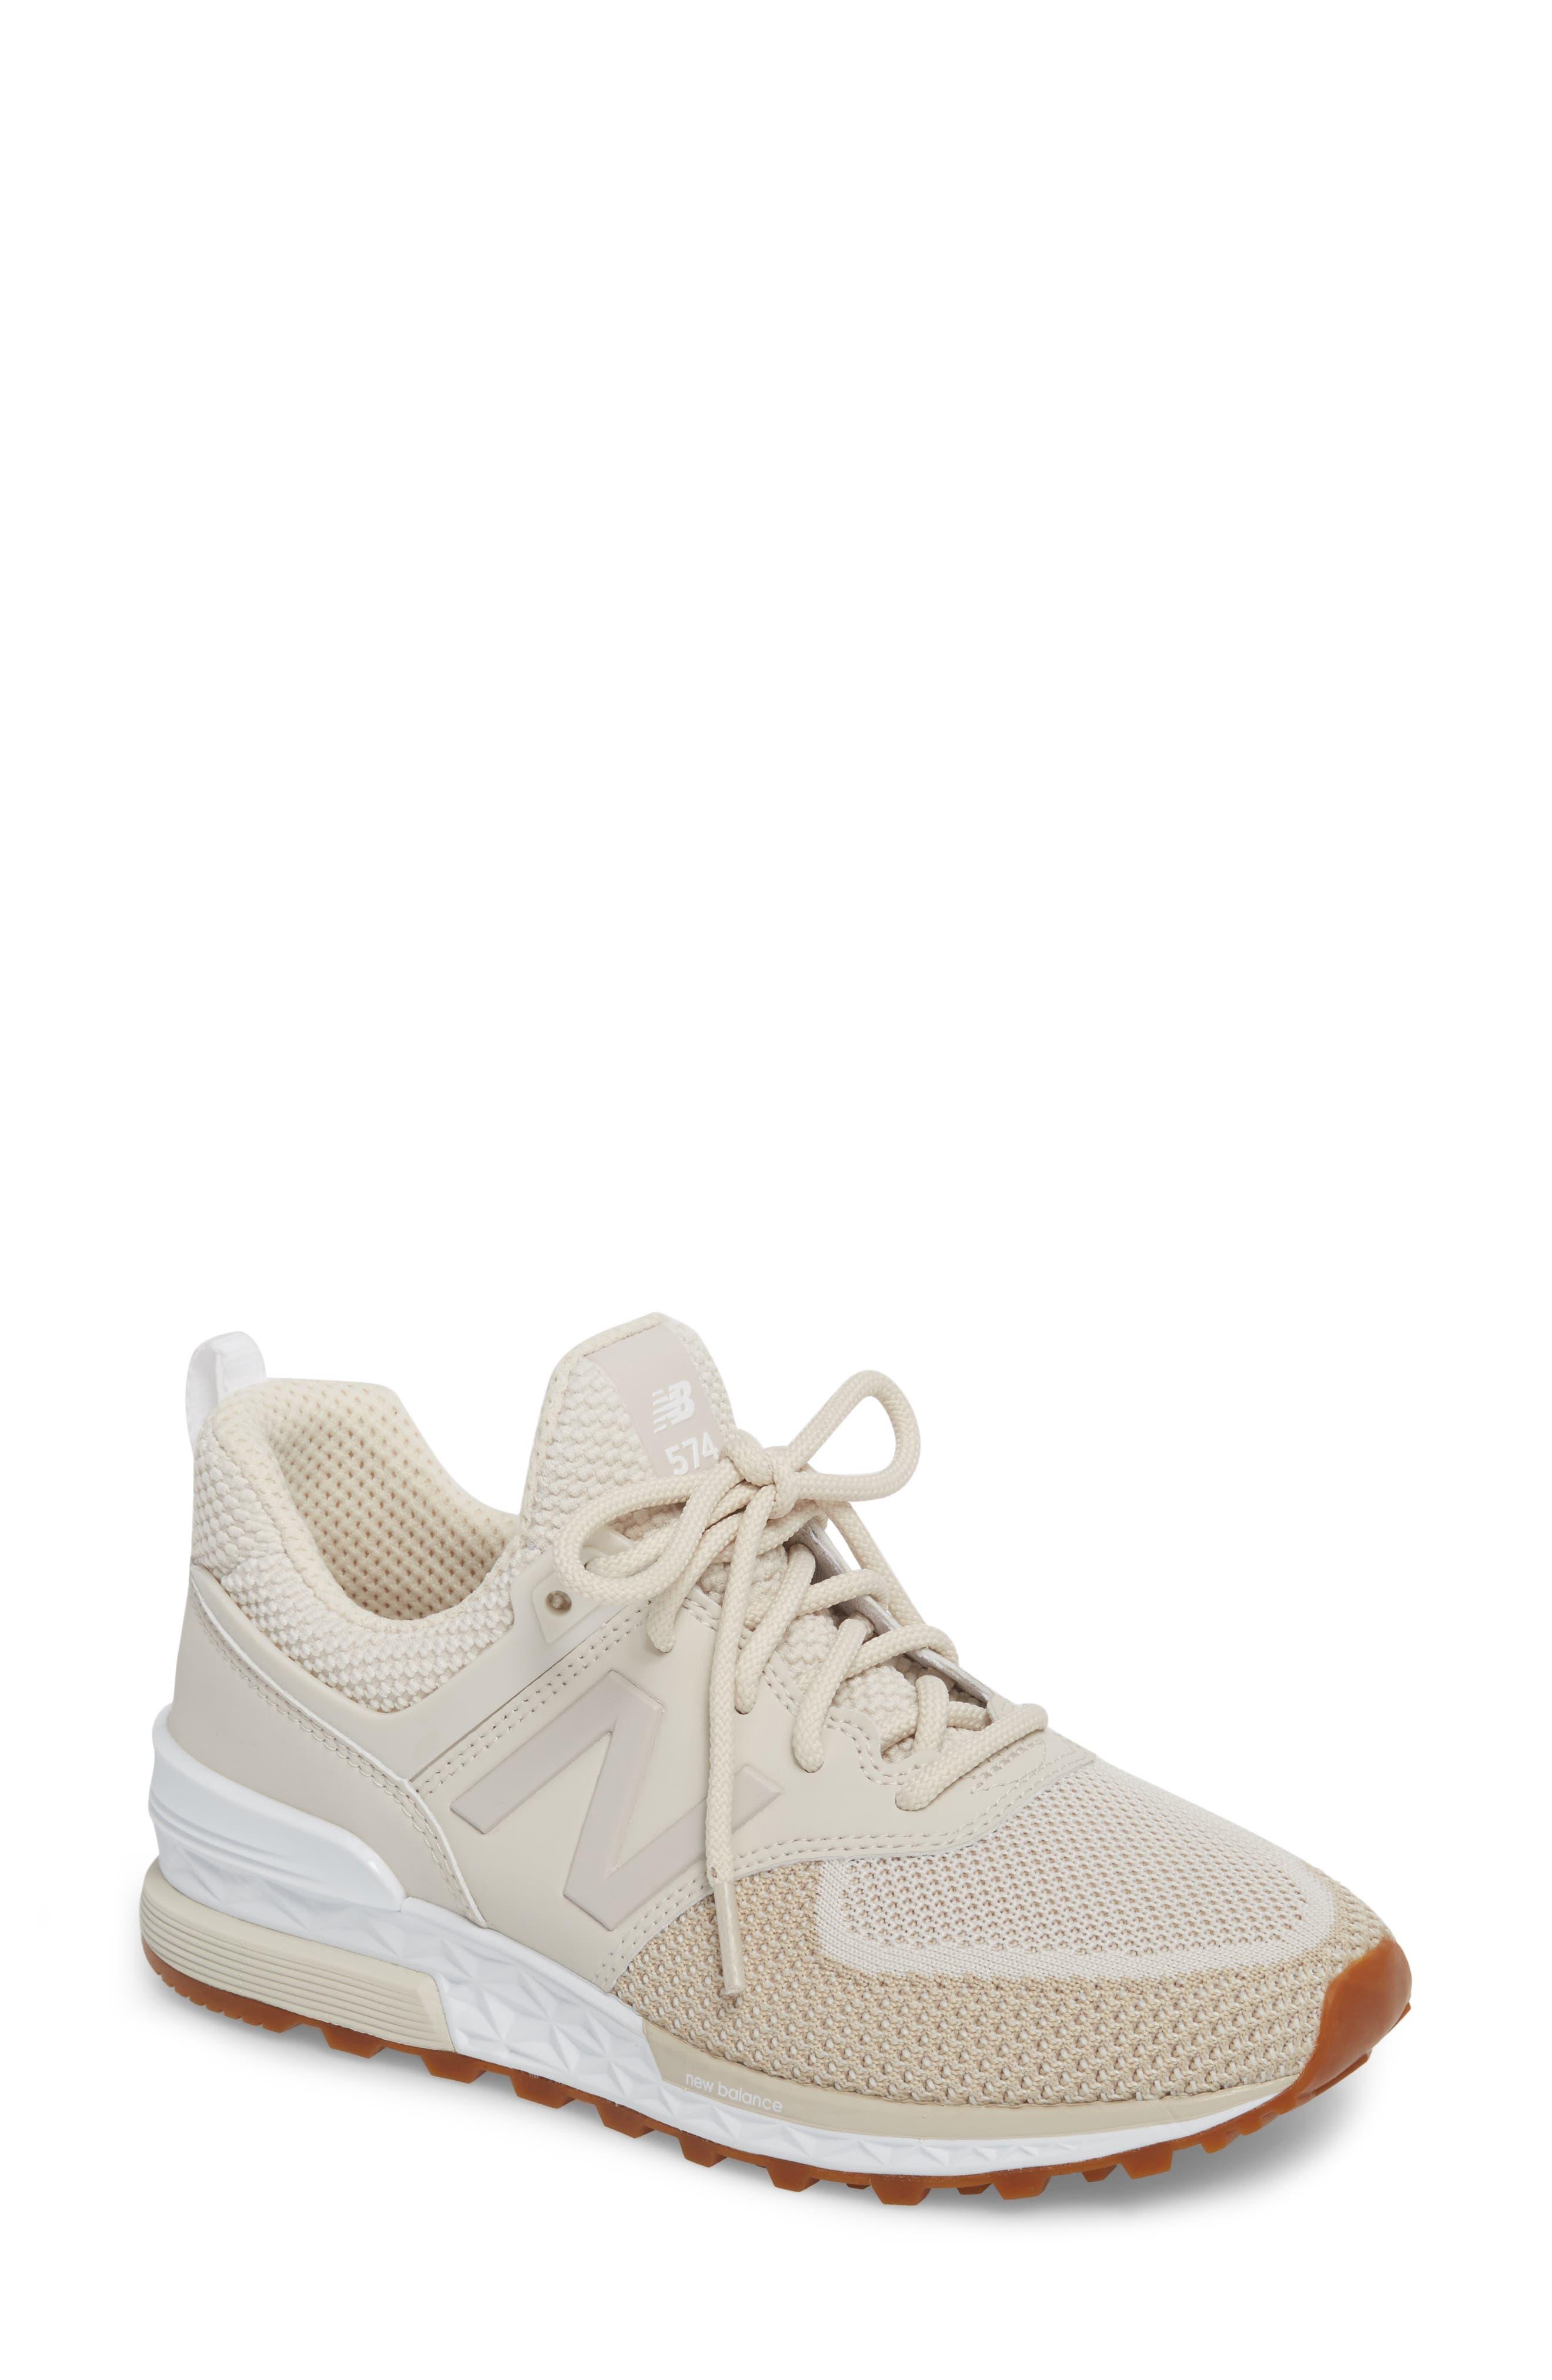 New Balance 574 Sport Sneaker (Women)